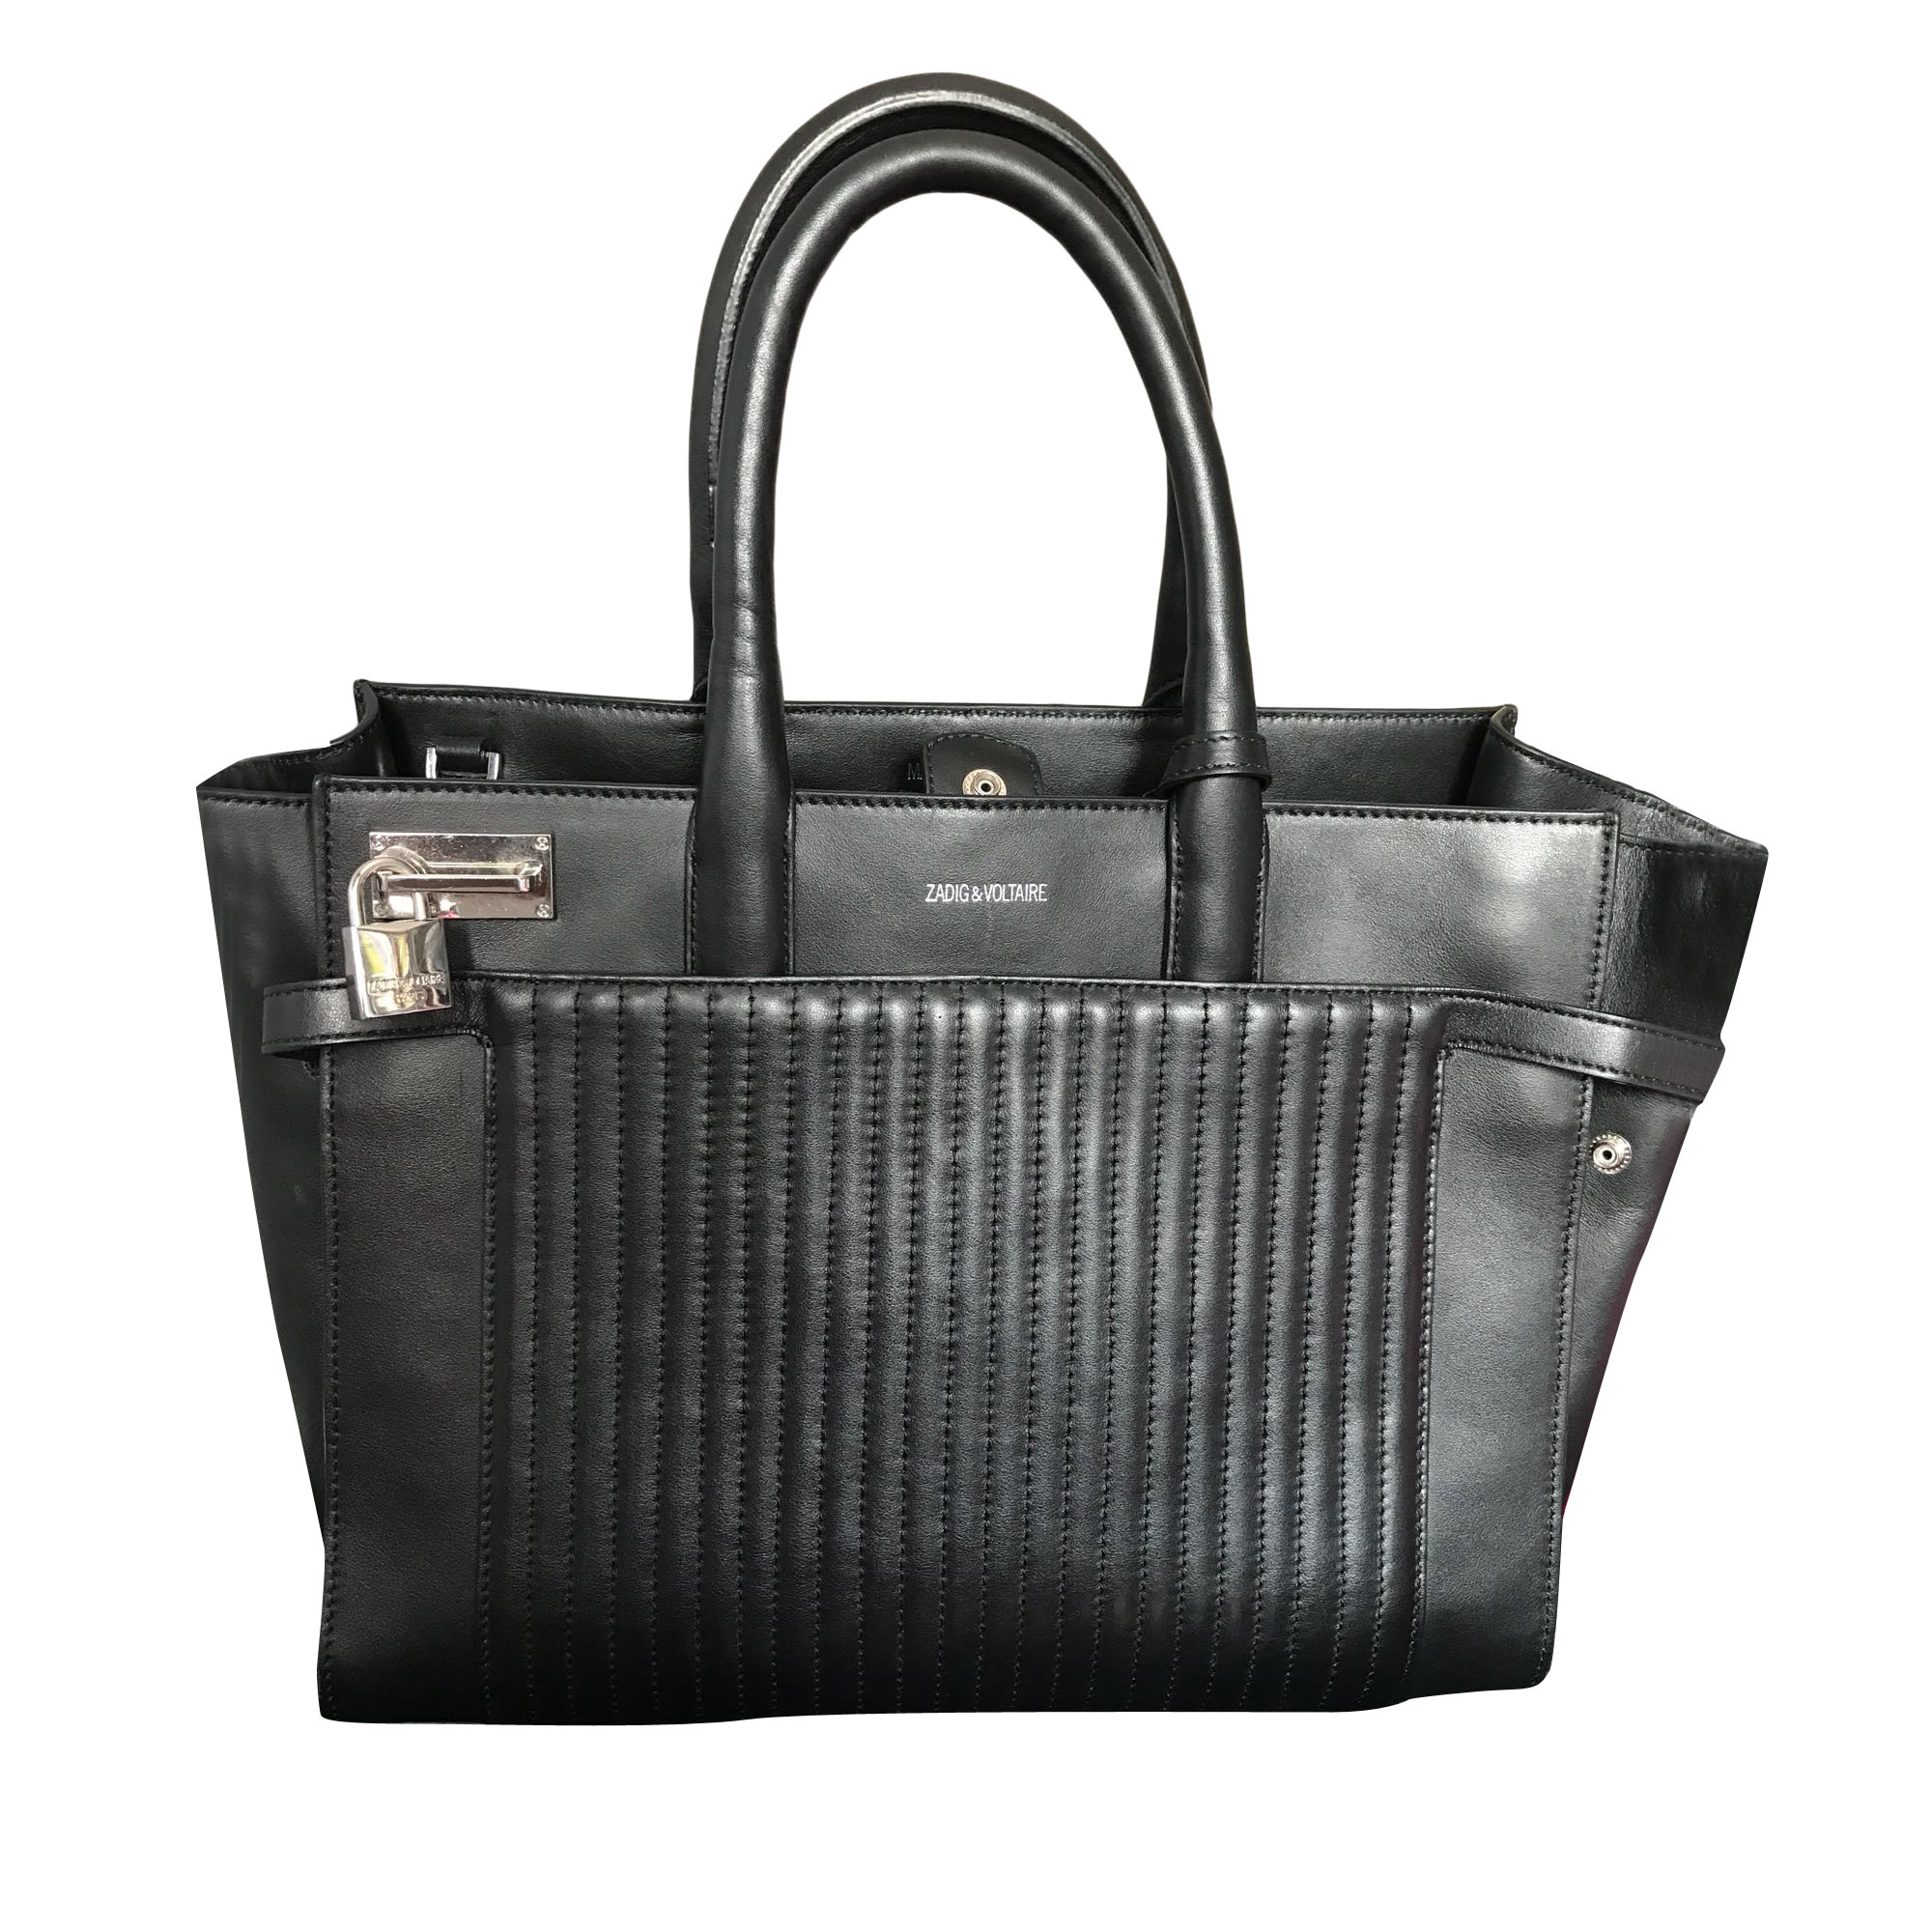 Leather Handbag ZADIG & VOLTAIRE Black